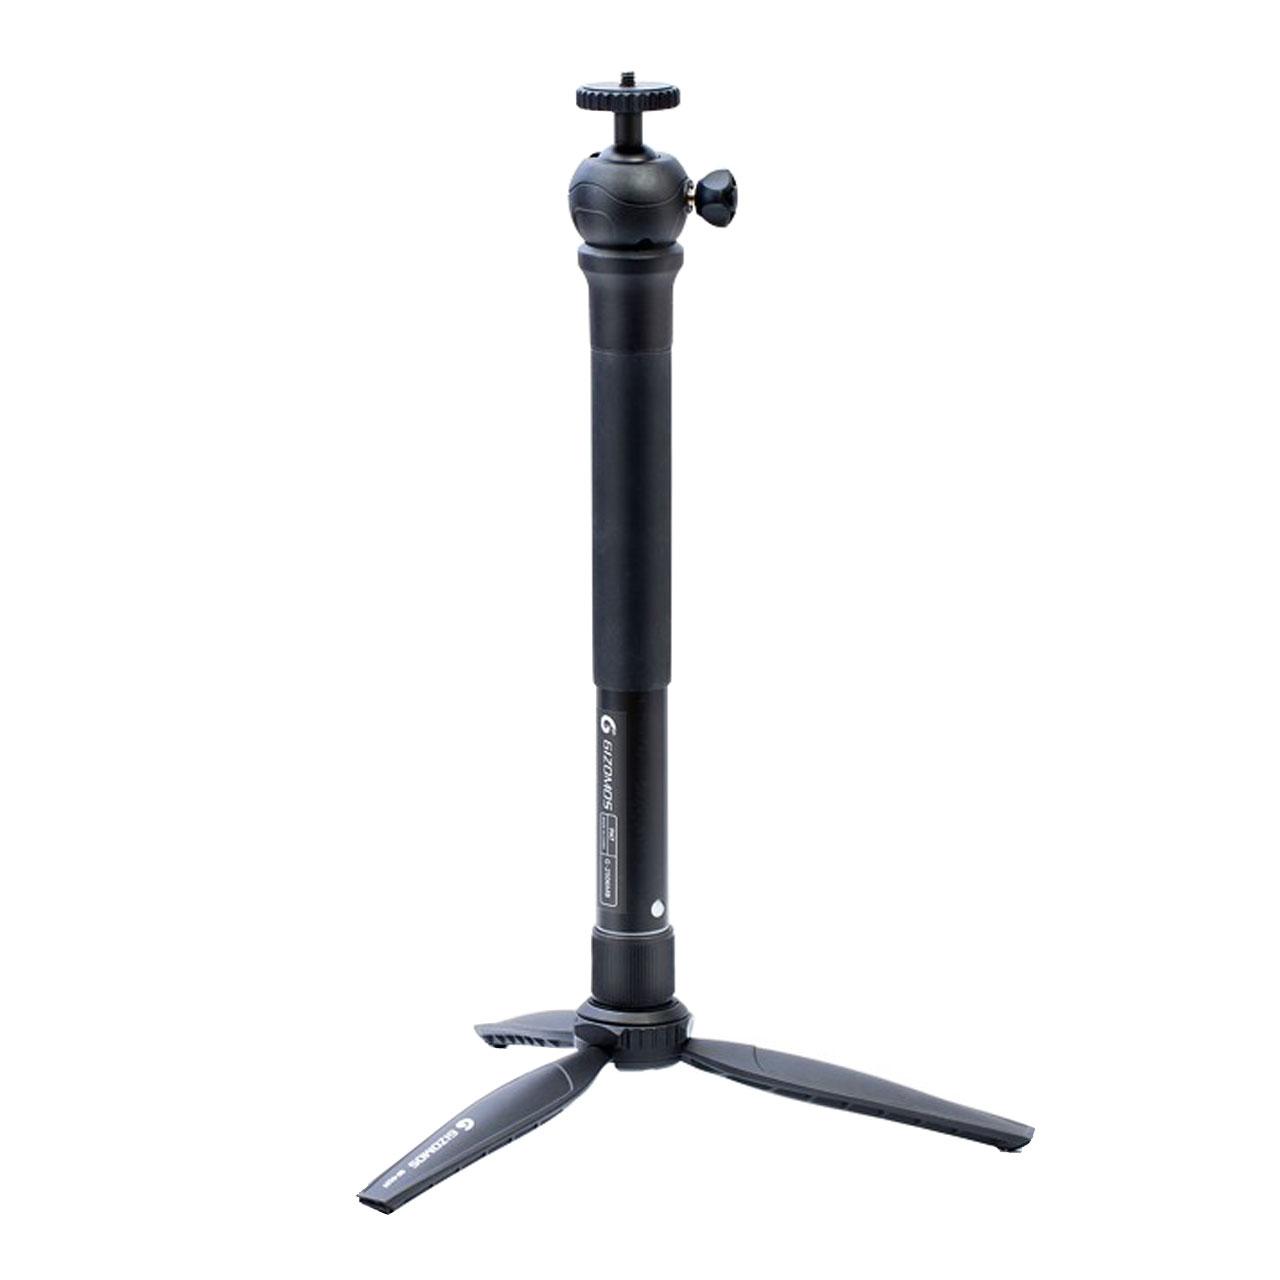 تک پایه دوربین جیزوموس مدل G-2506MB